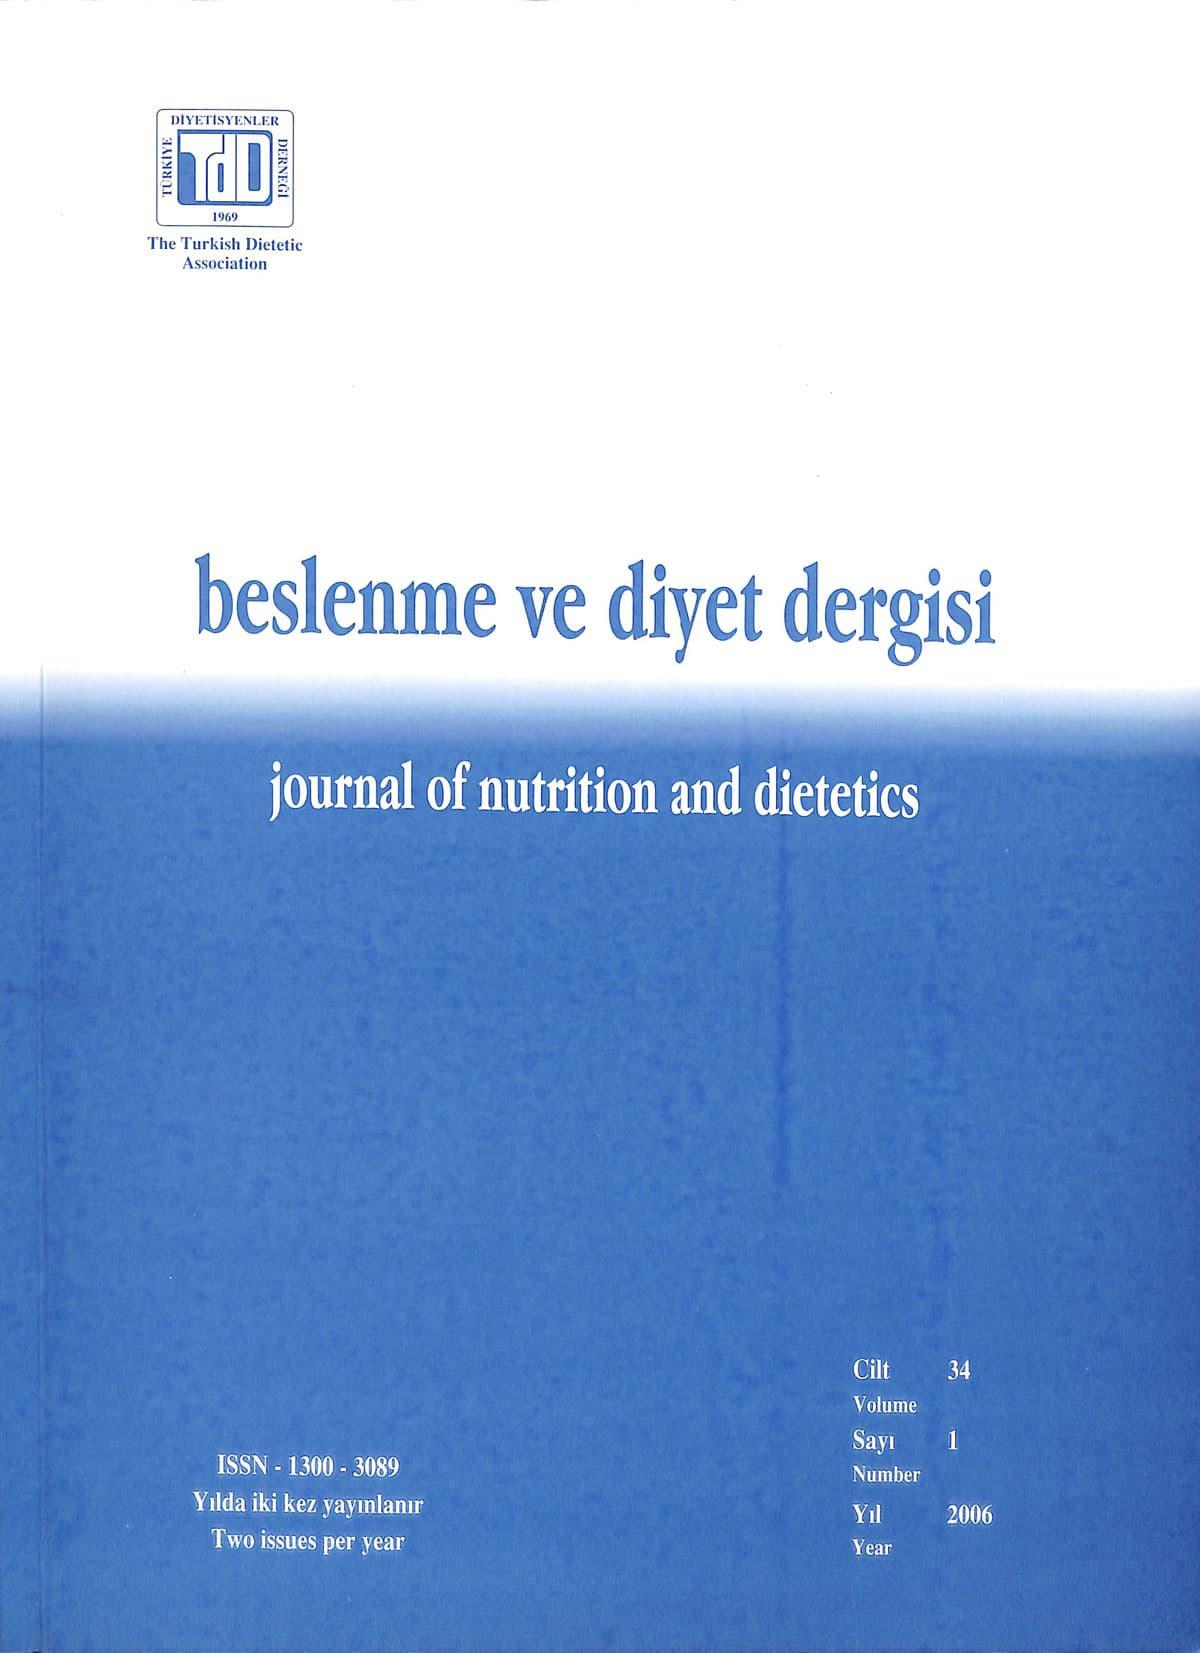 Cilt 34 Sayı 1 (2006)